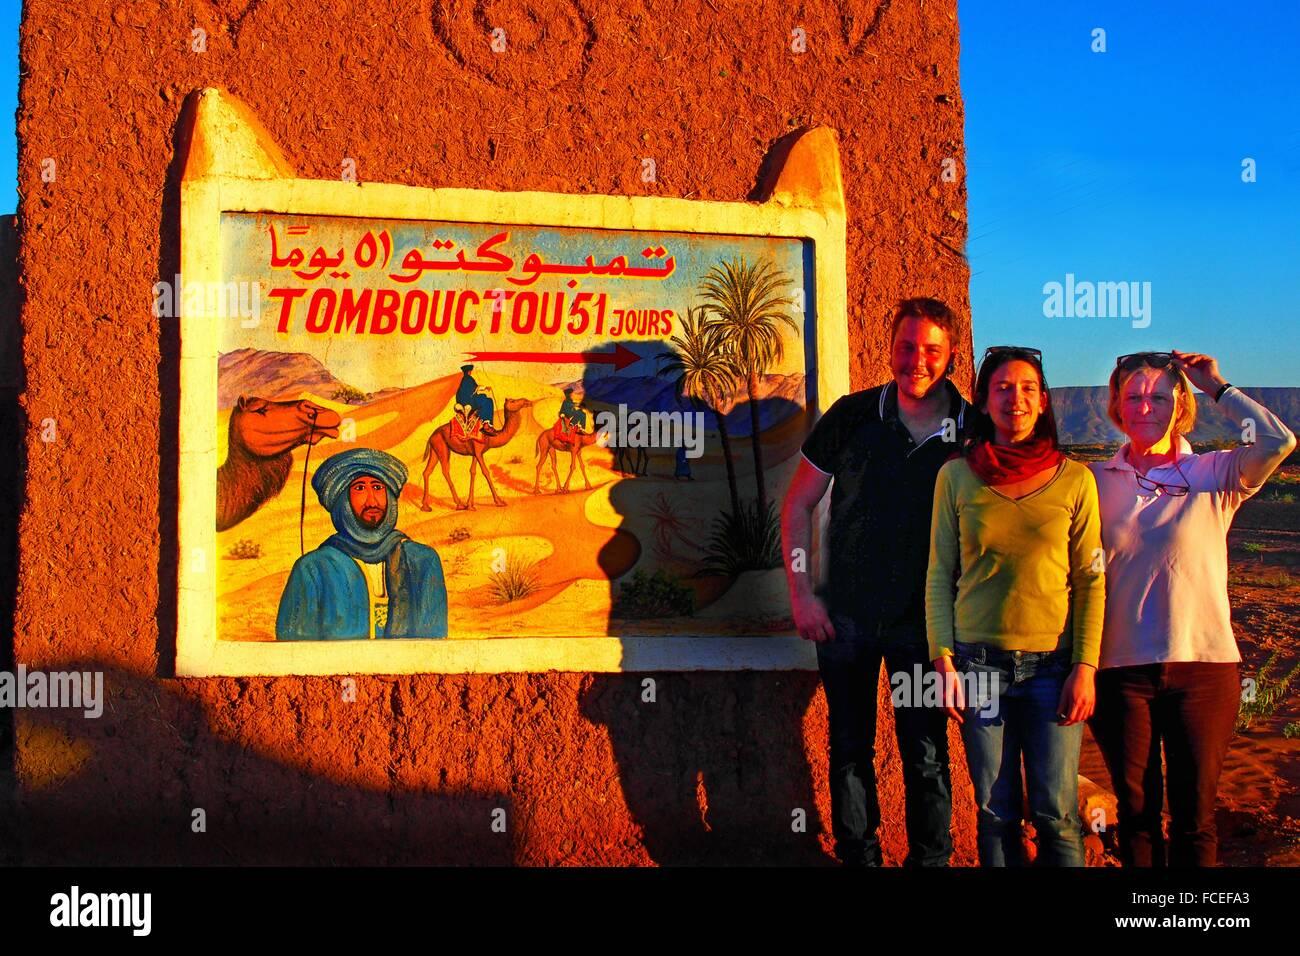 Tourists at the door of the Sahara desert, at Tinfou, 51 days from Timbuktu on camel back, Zagora province, Morocco - Stock Image